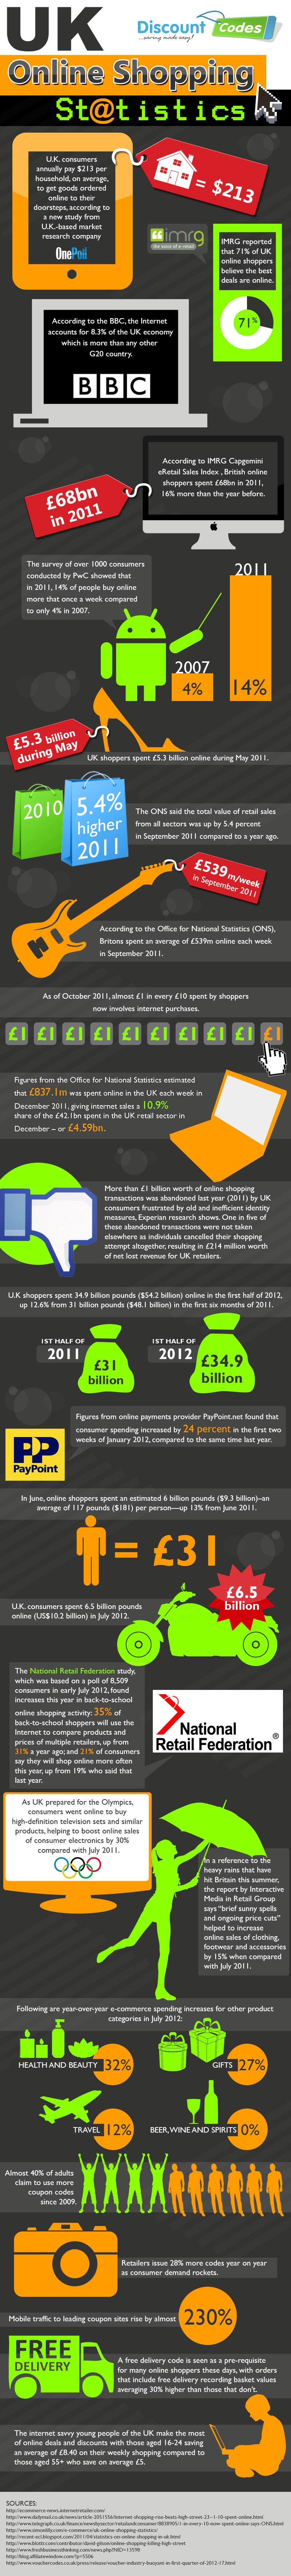 uk-online-spending-habbits_504dc8175a87c